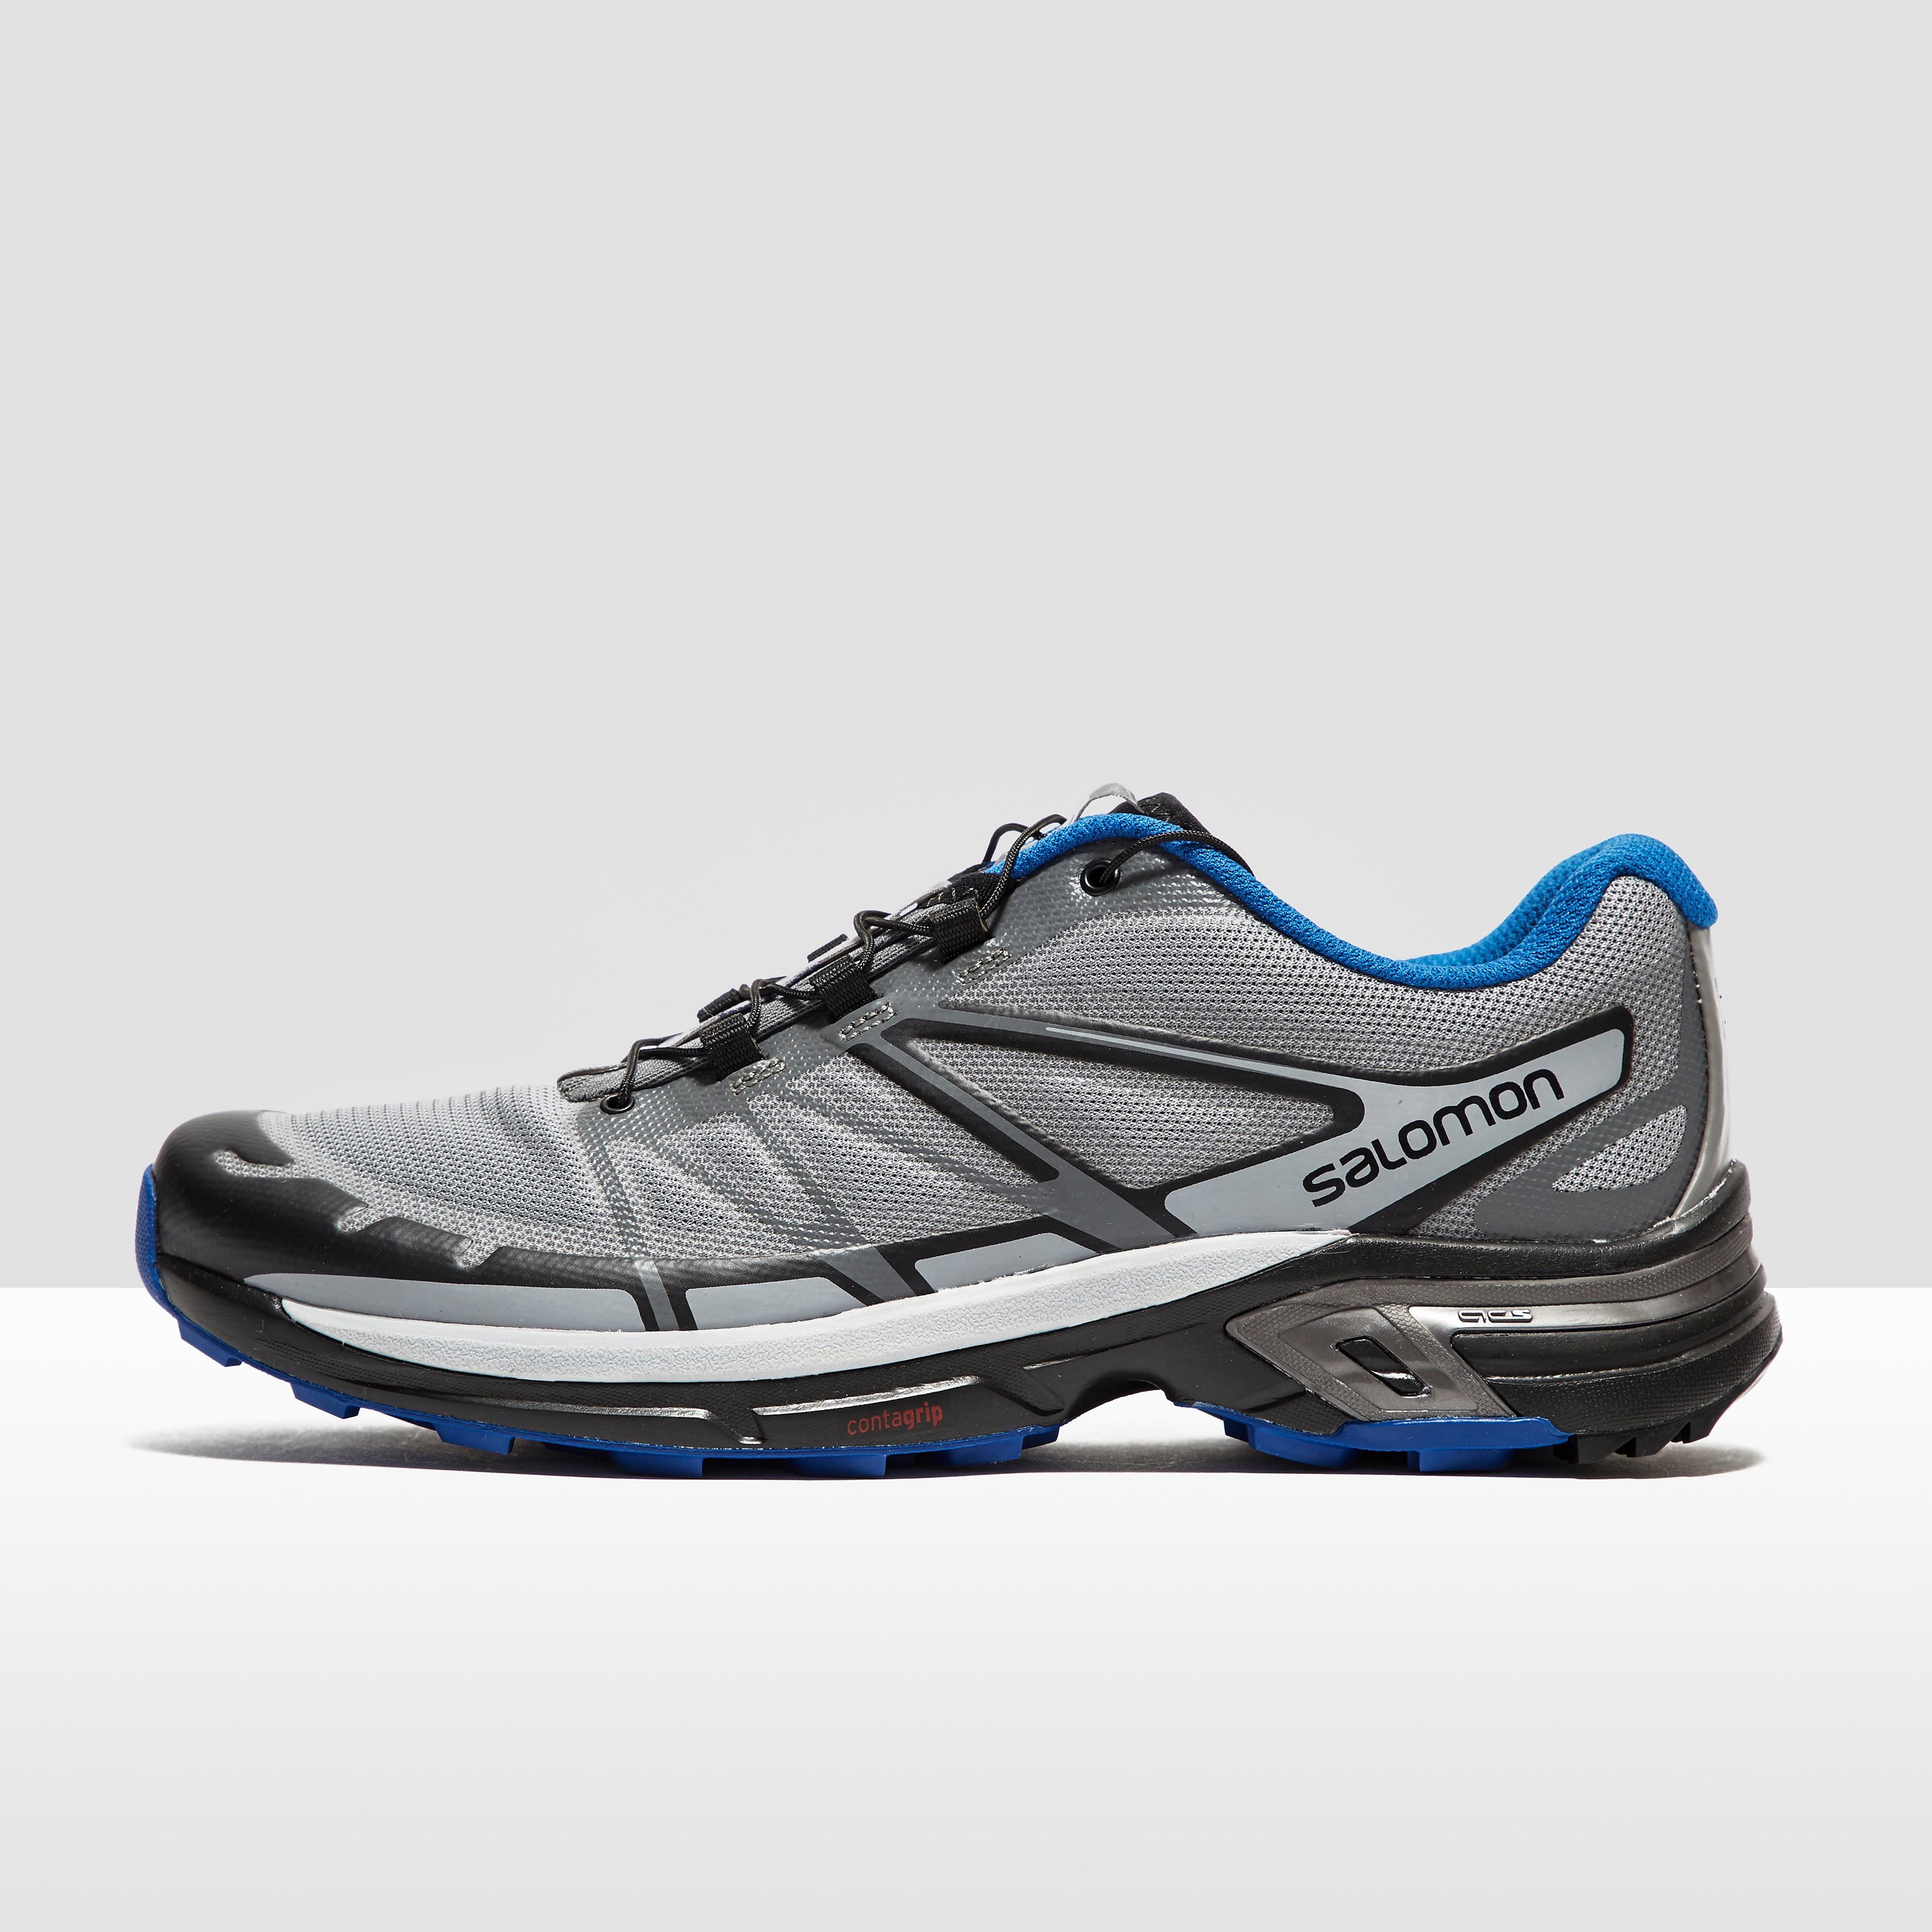 Salomon Wings Pro 2 Men's Trail Running Shoes